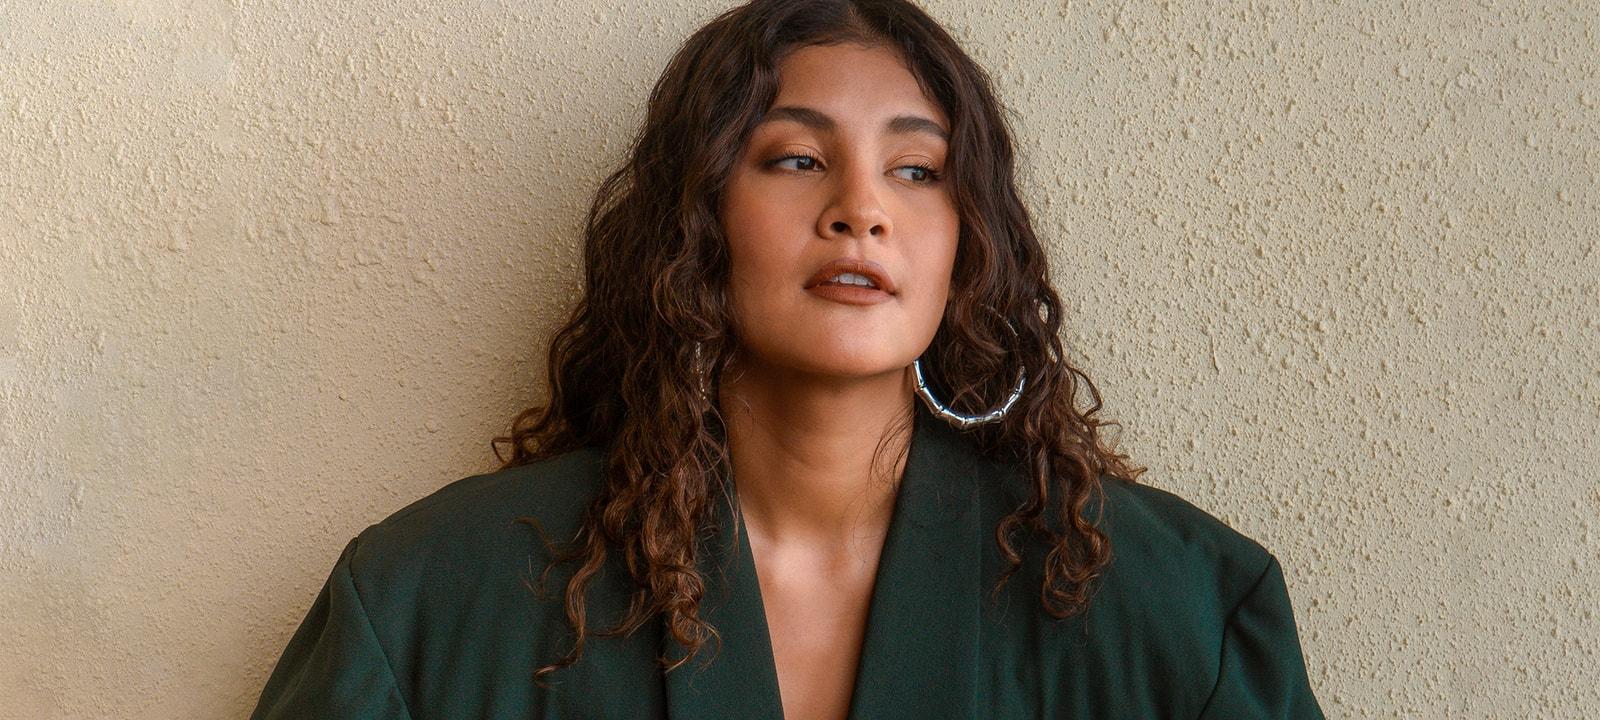 Kiana V valenciano dazed ep filipino pop rnb artist music singer artist musician